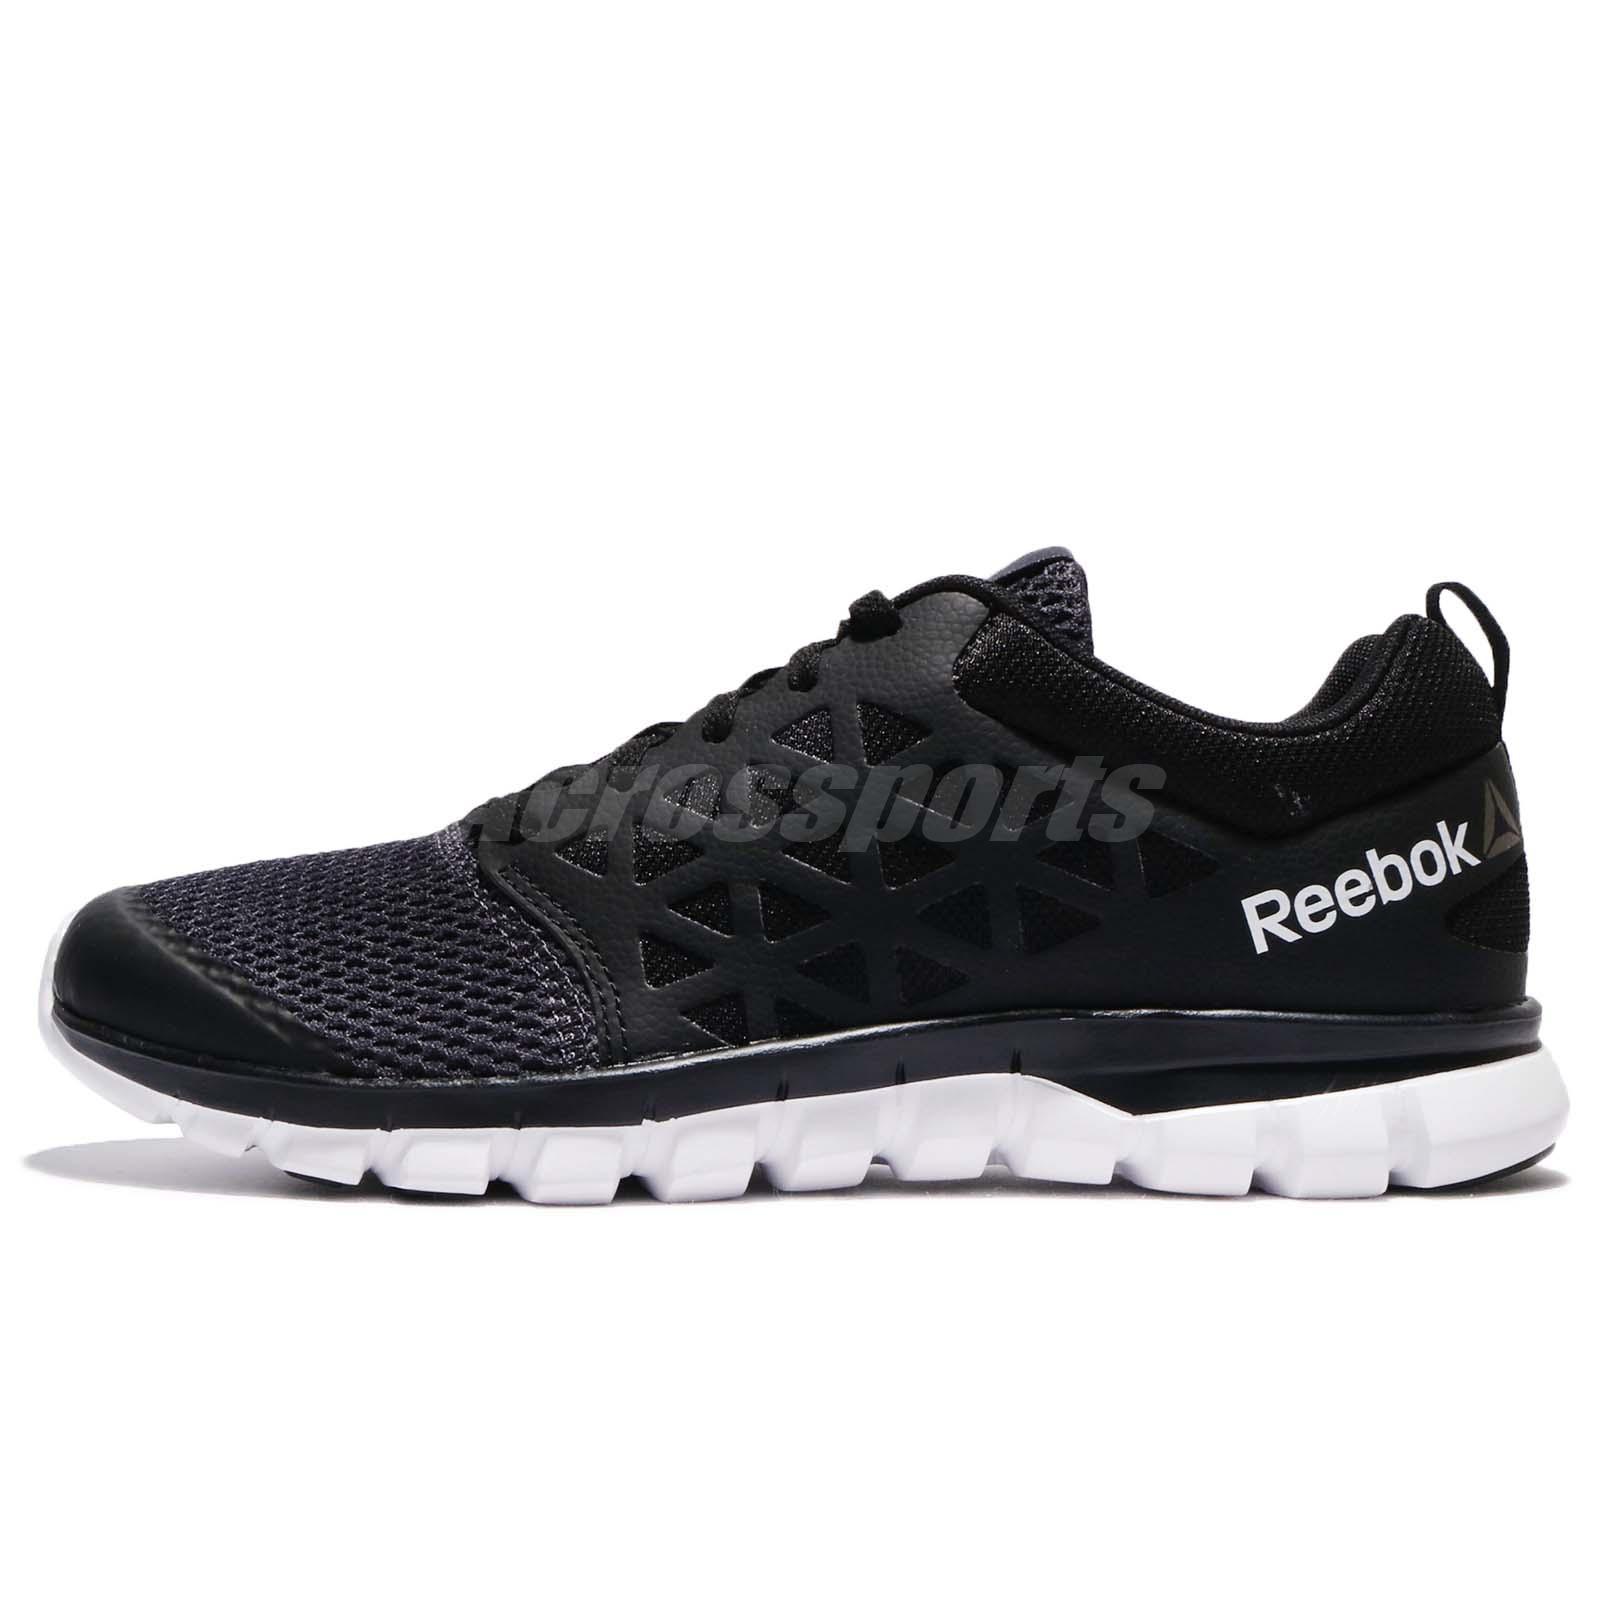 82cb4529b651eb reebok running shoes made in vietnam